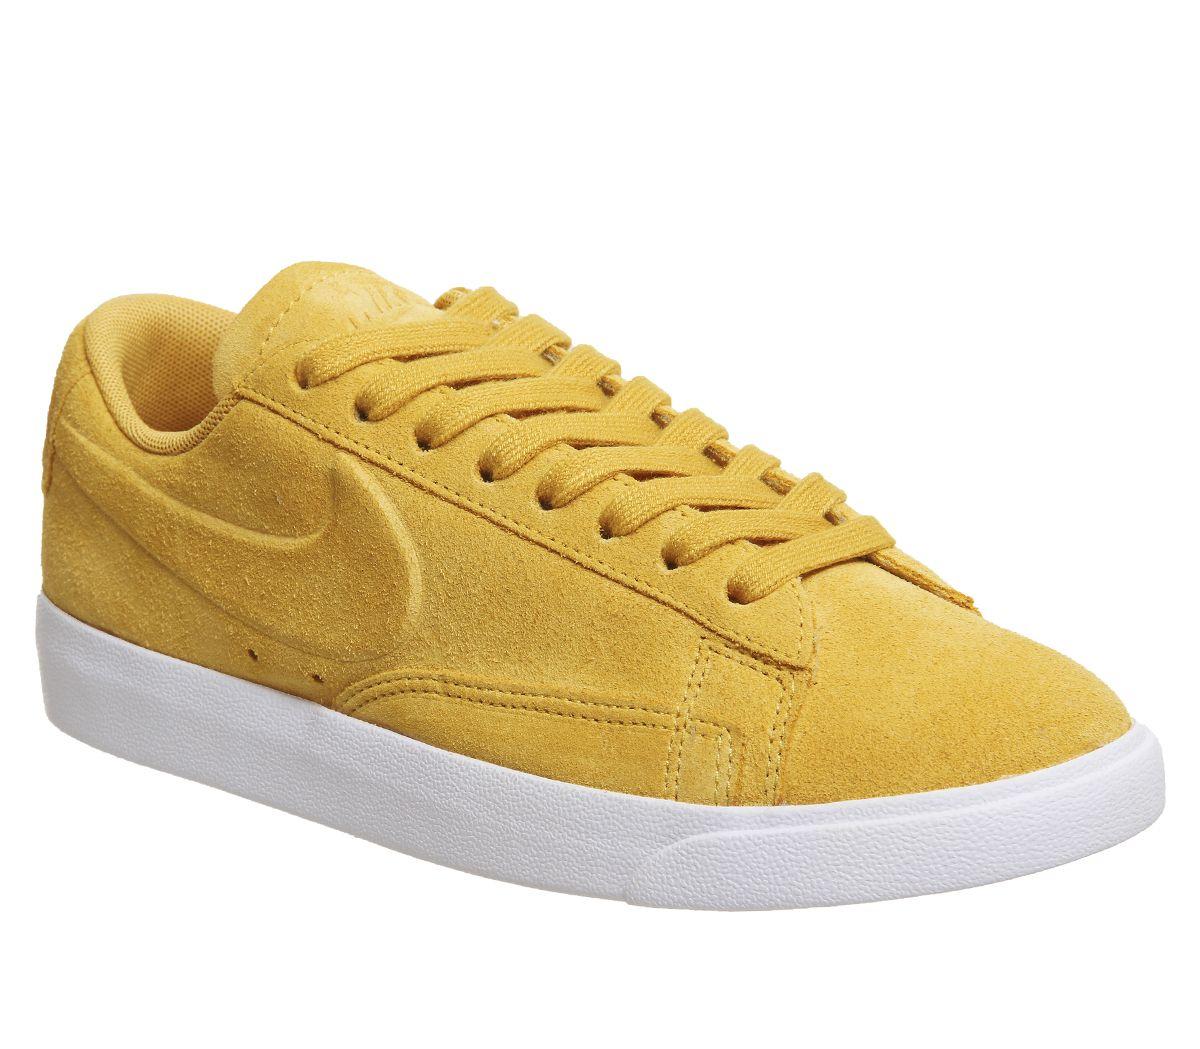 new concept 1f5ef 87214 Nike Blazer Low Trainers Mineral Yellow Mineral Yellow - Hers trainers